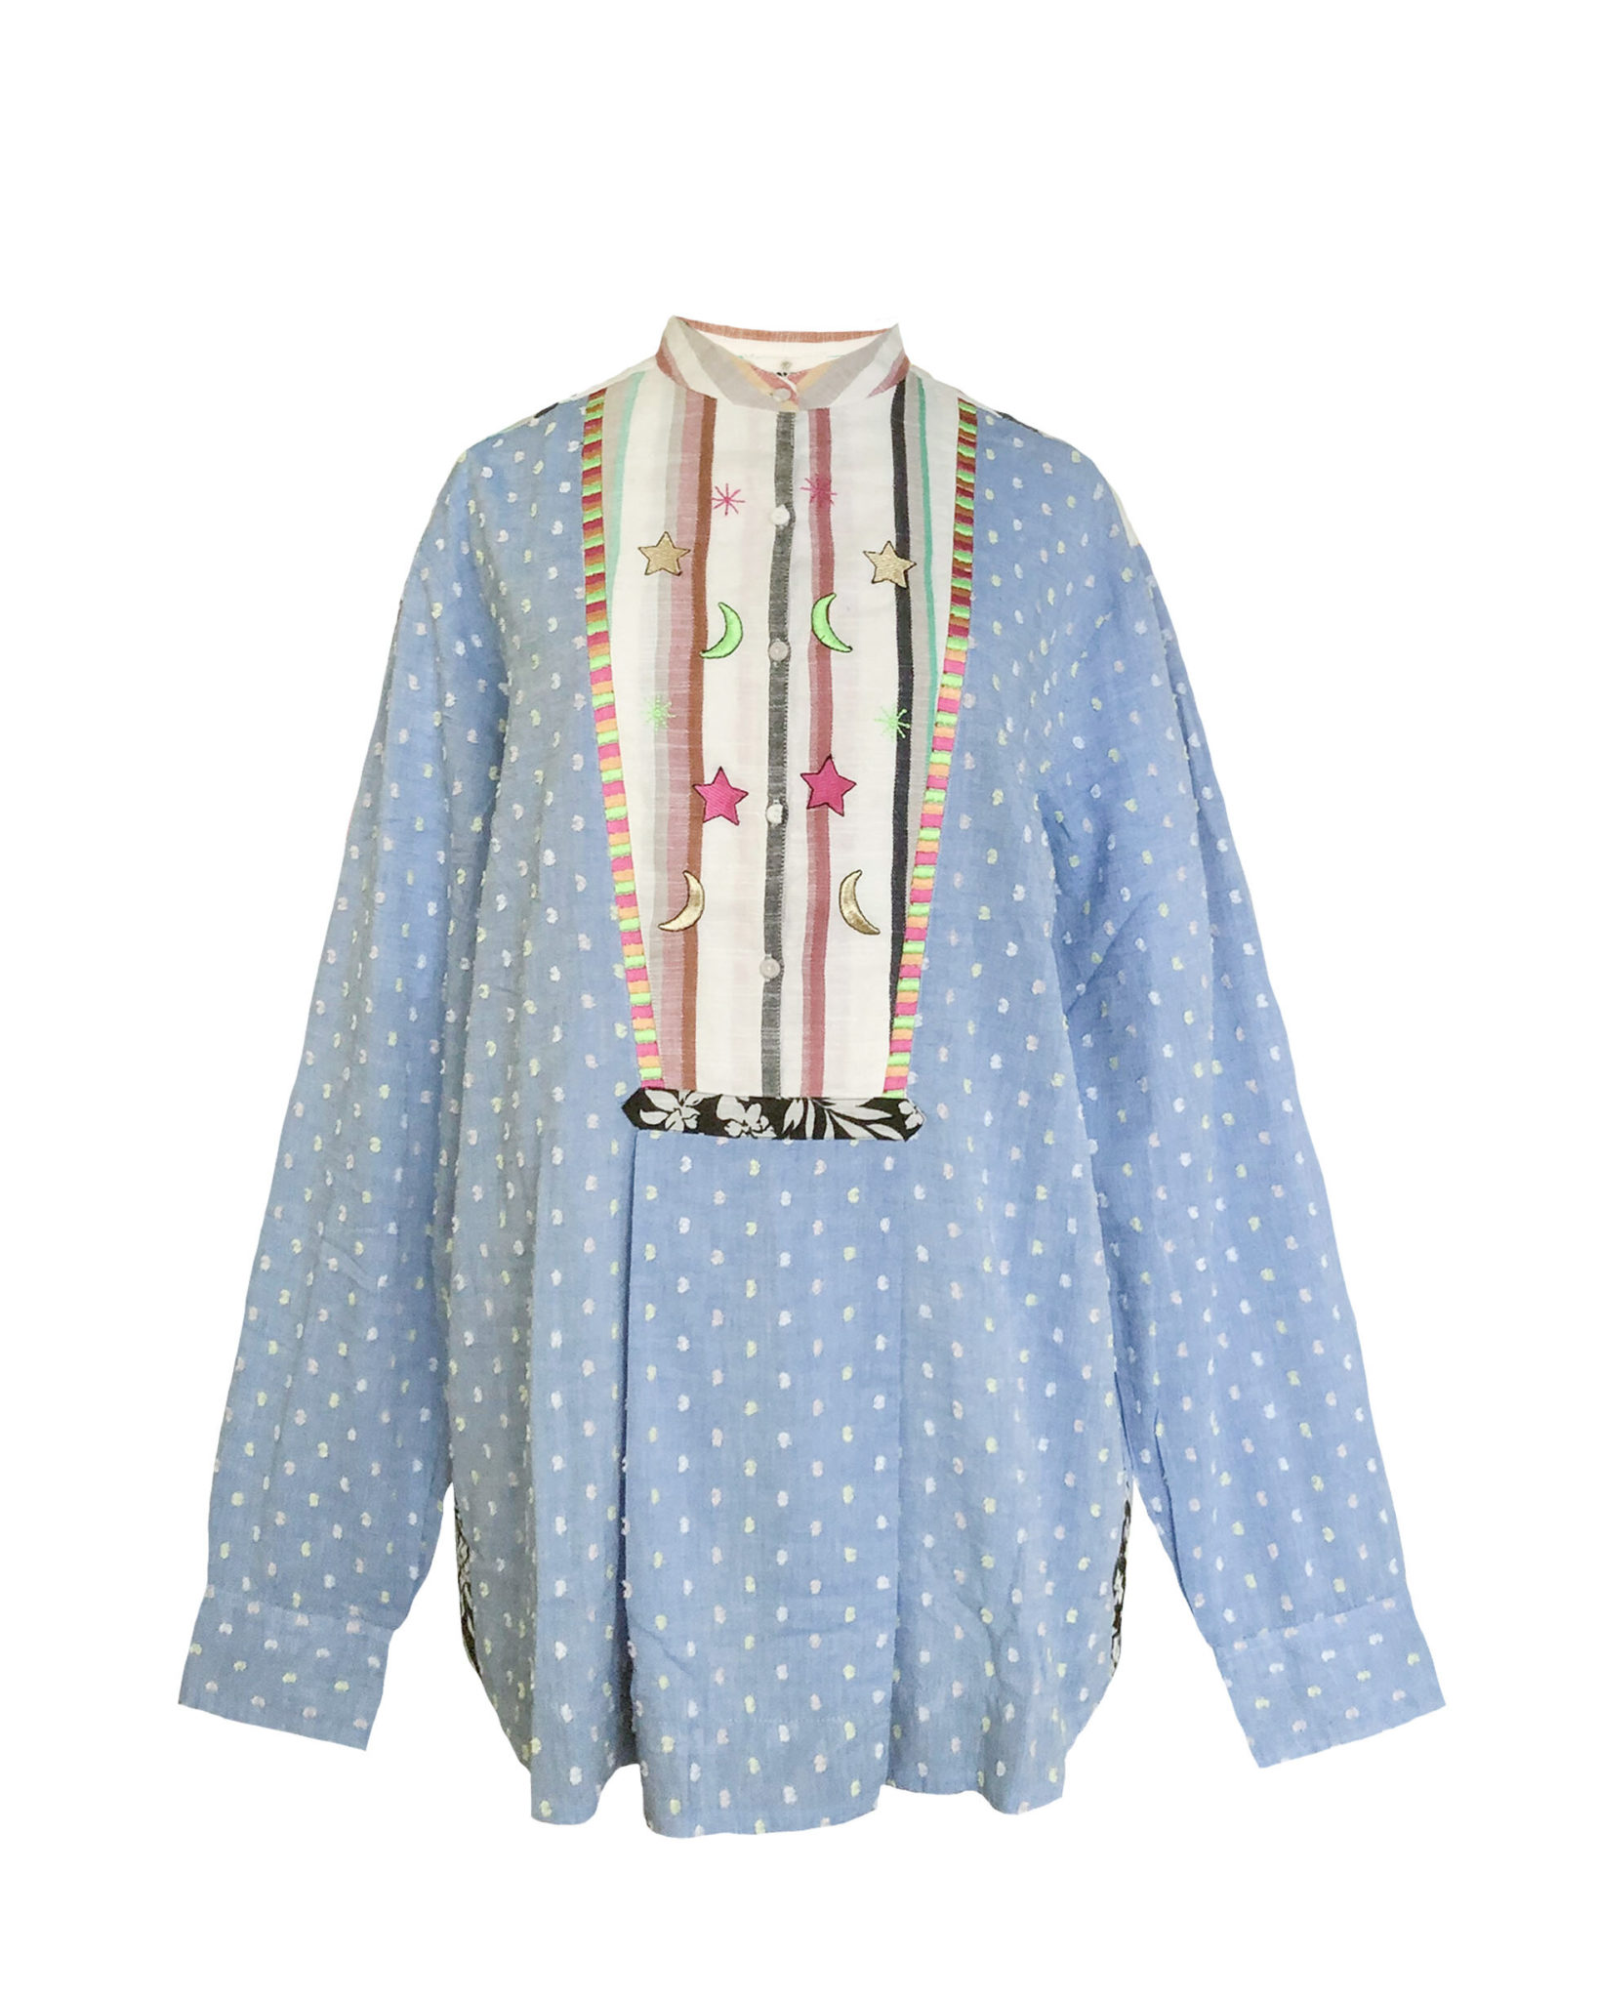 Plumetis/Stripes Shirt